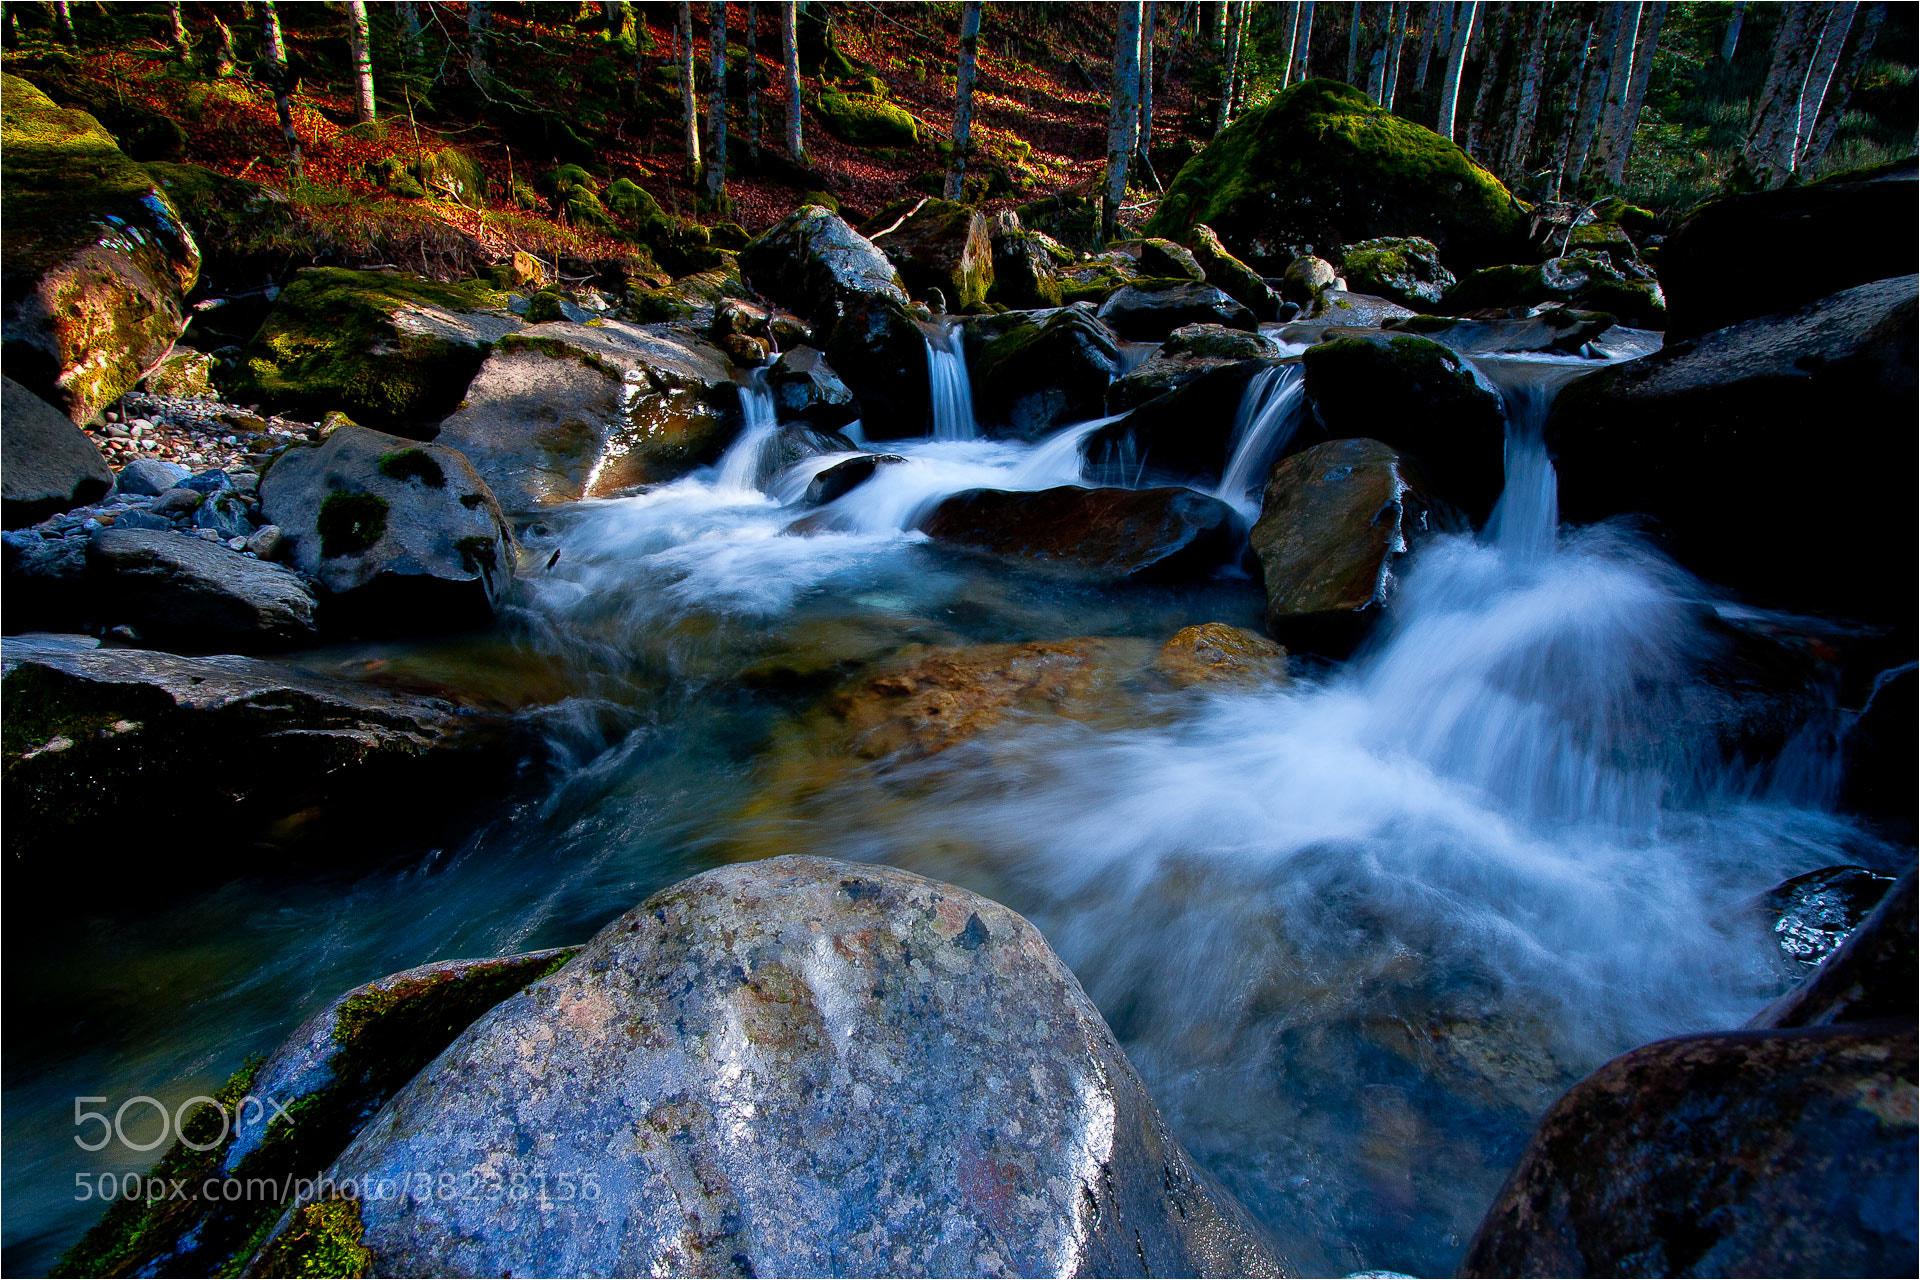 Photograph Gave d´Bious (Hautes Pyrénées) by Ferran Cartagena  on 500px